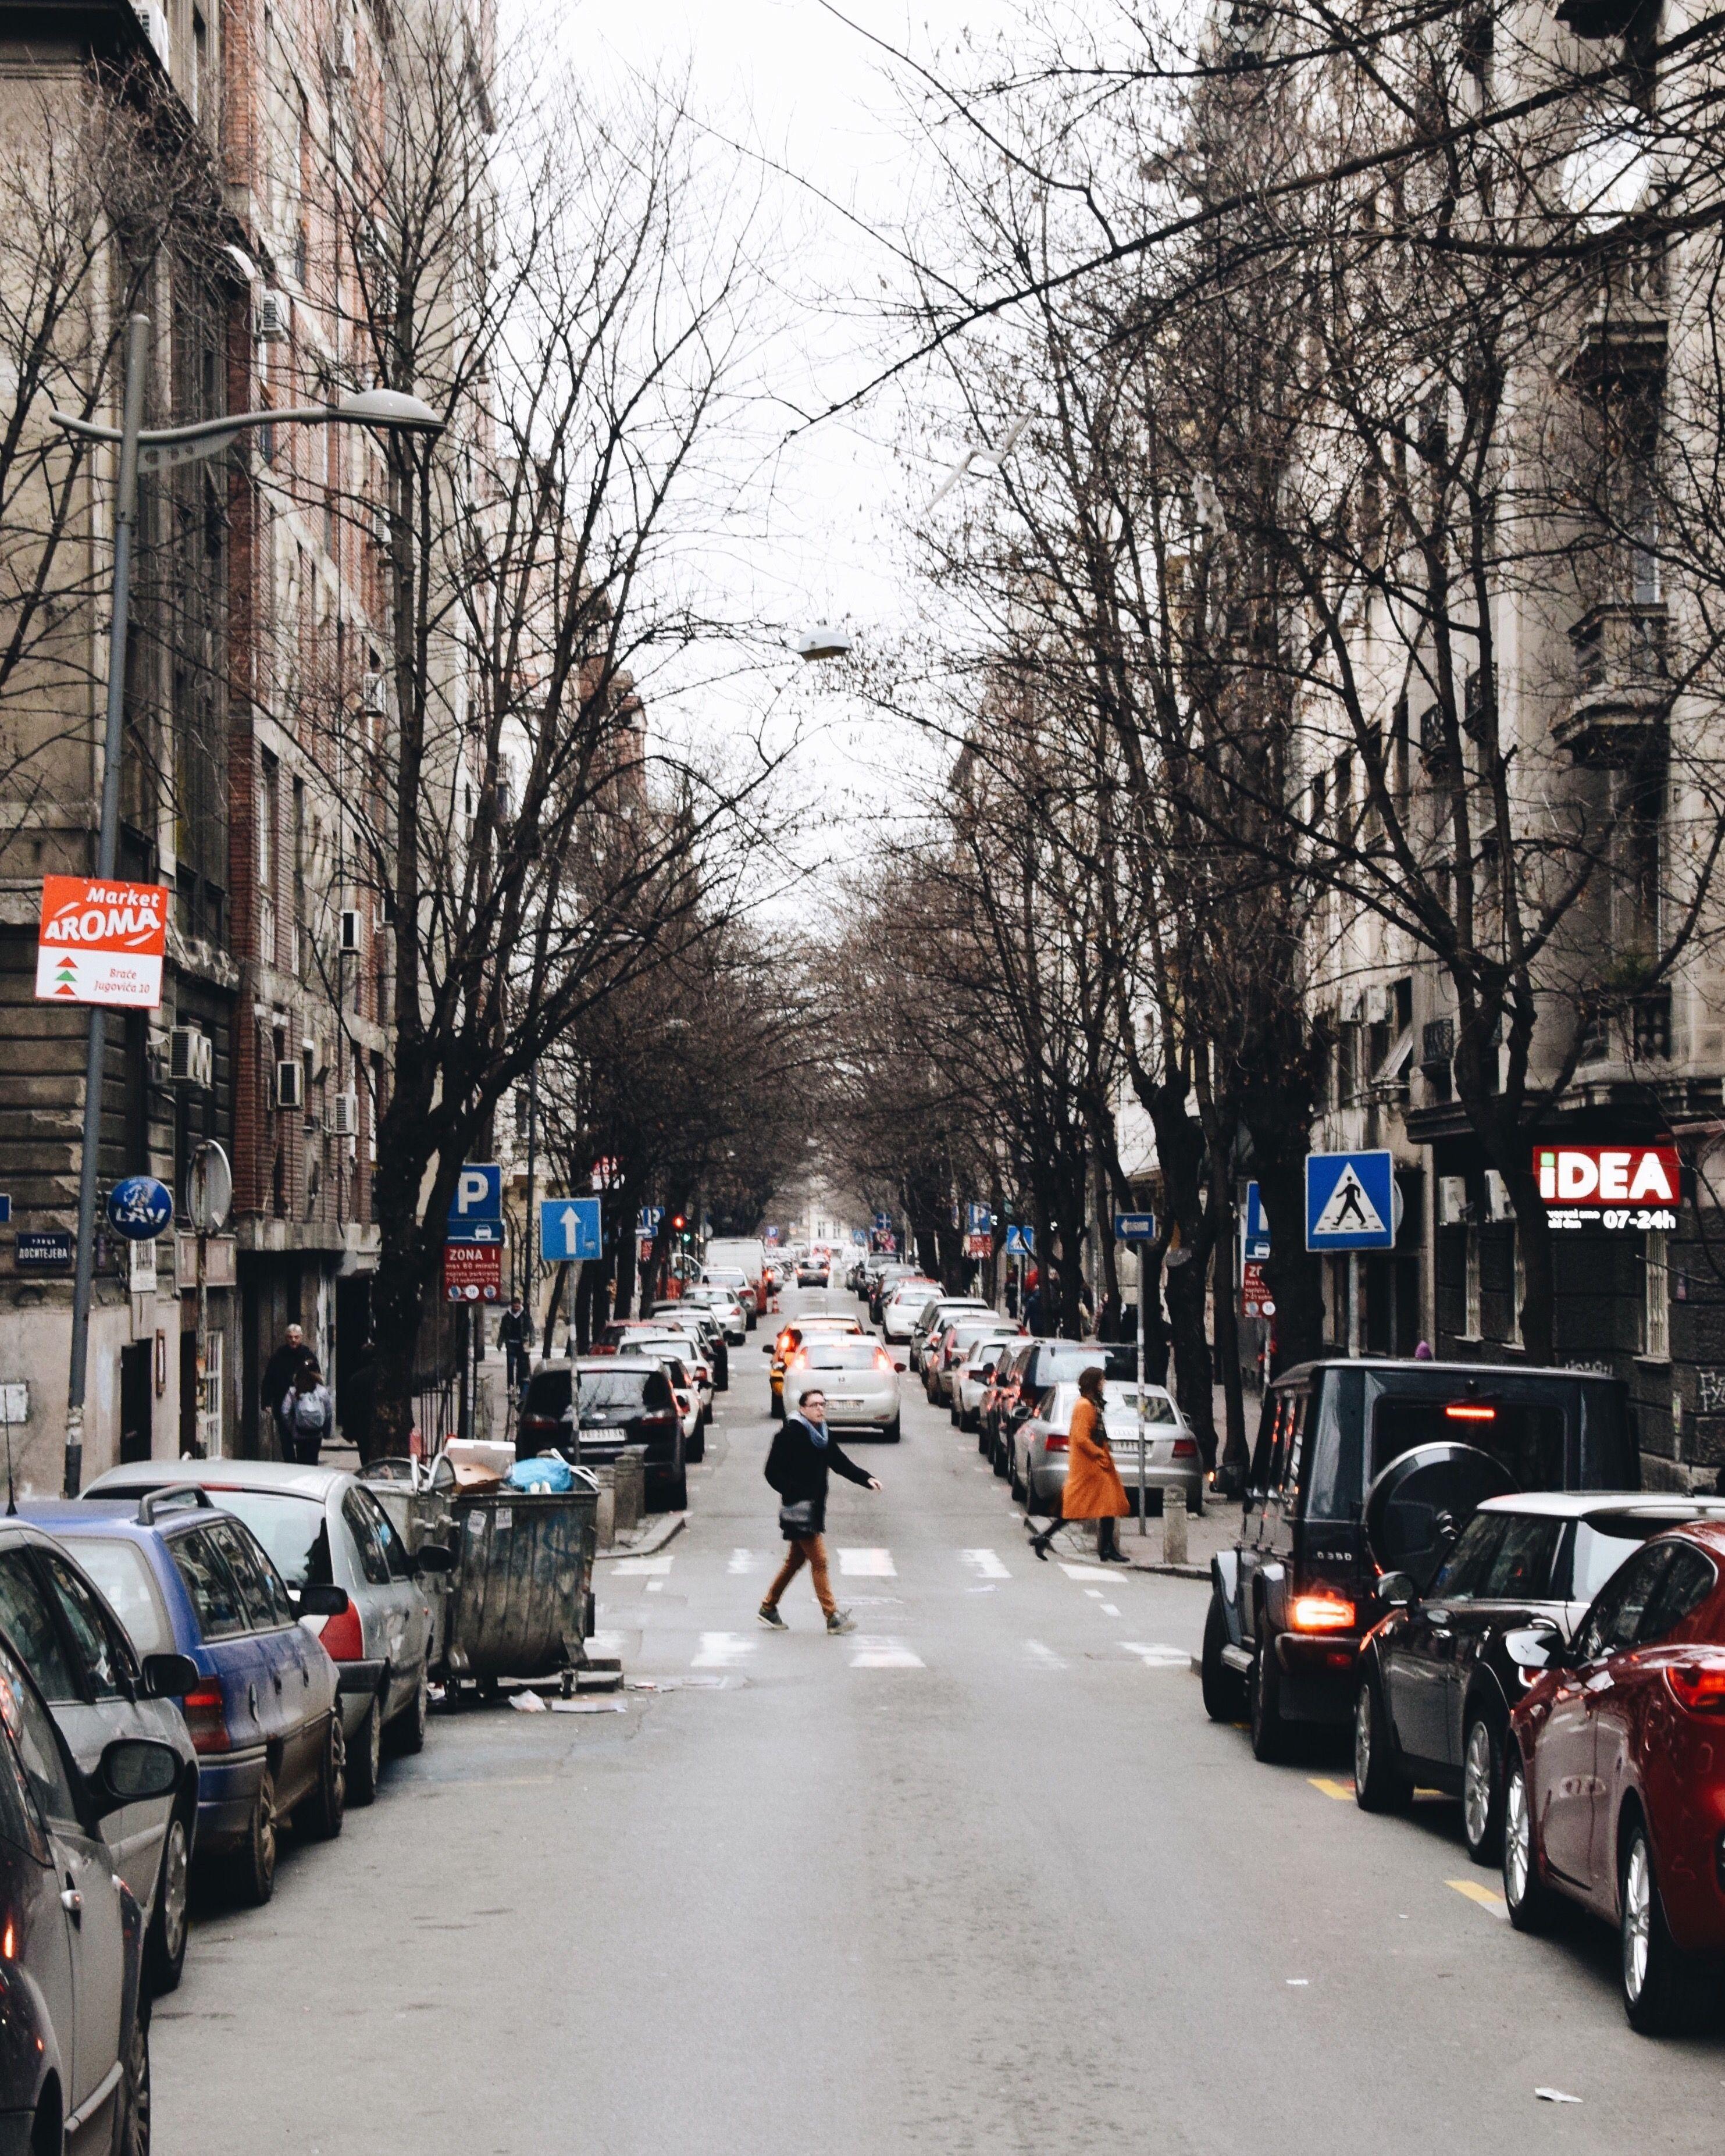 brace jugovica beograd mapa Streets of Dorcol, Belgrade, 2017. | BEOGRAD | Pinterest brace jugovica beograd mapa